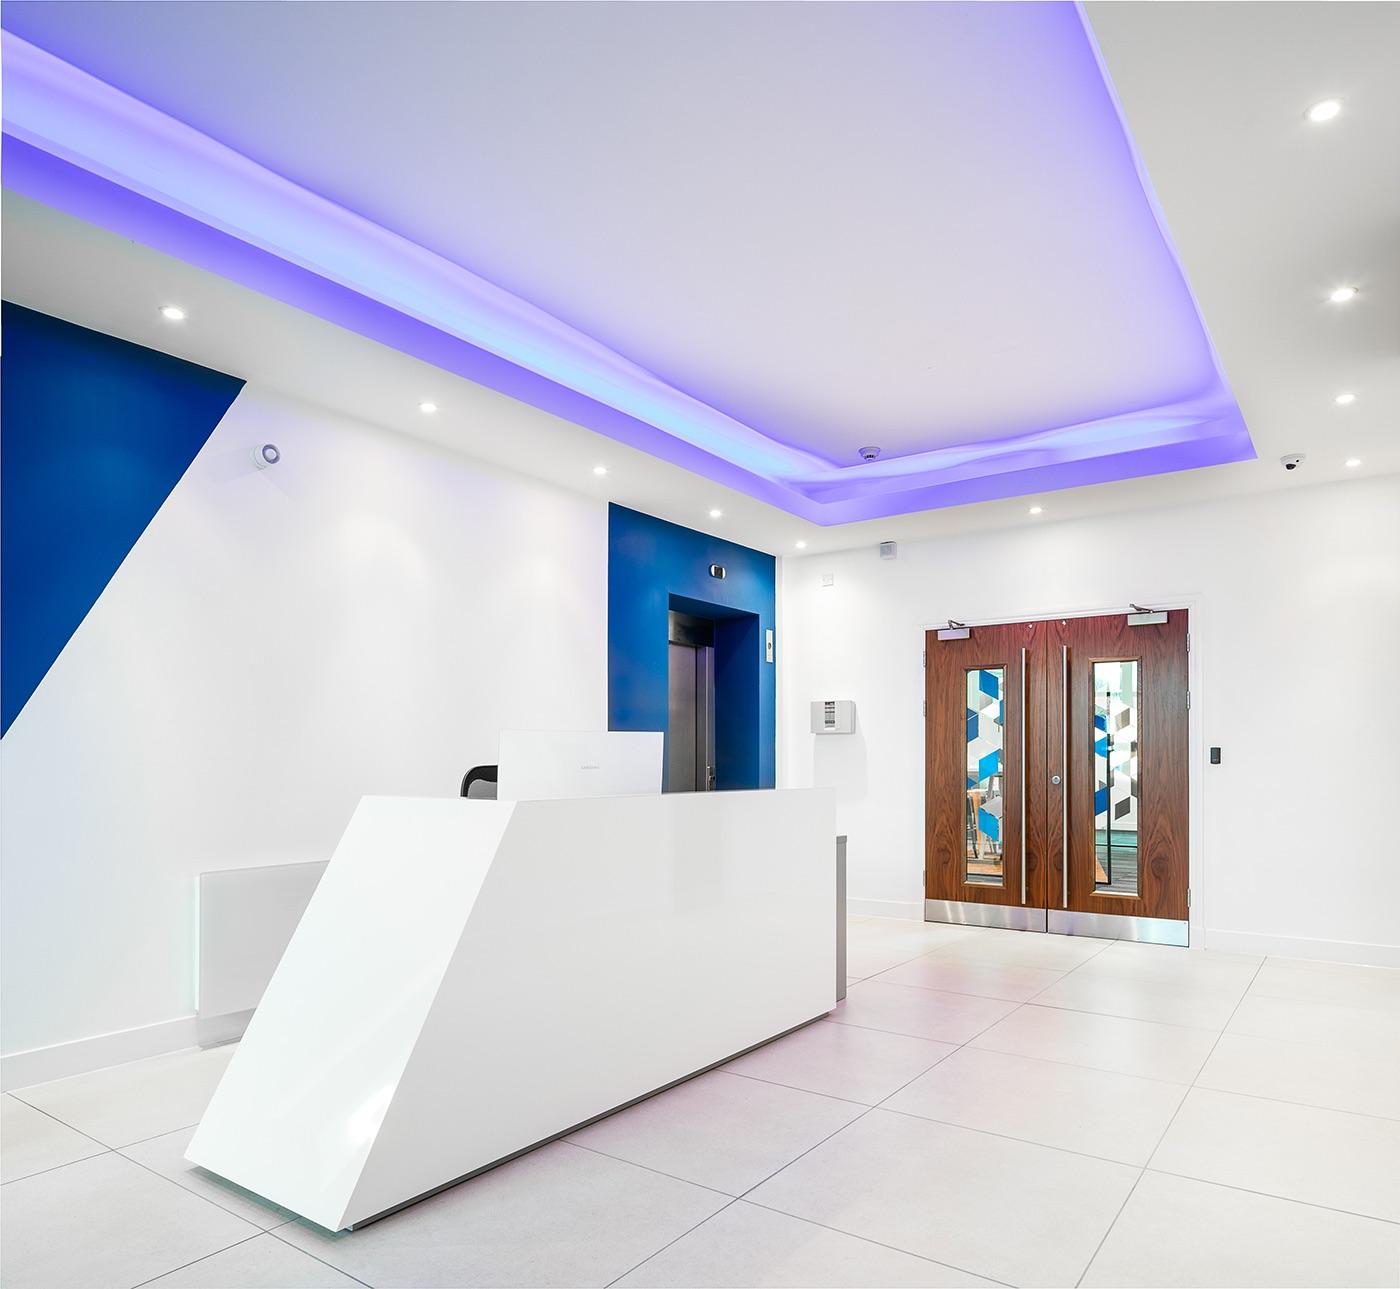 blue-prism-office-4